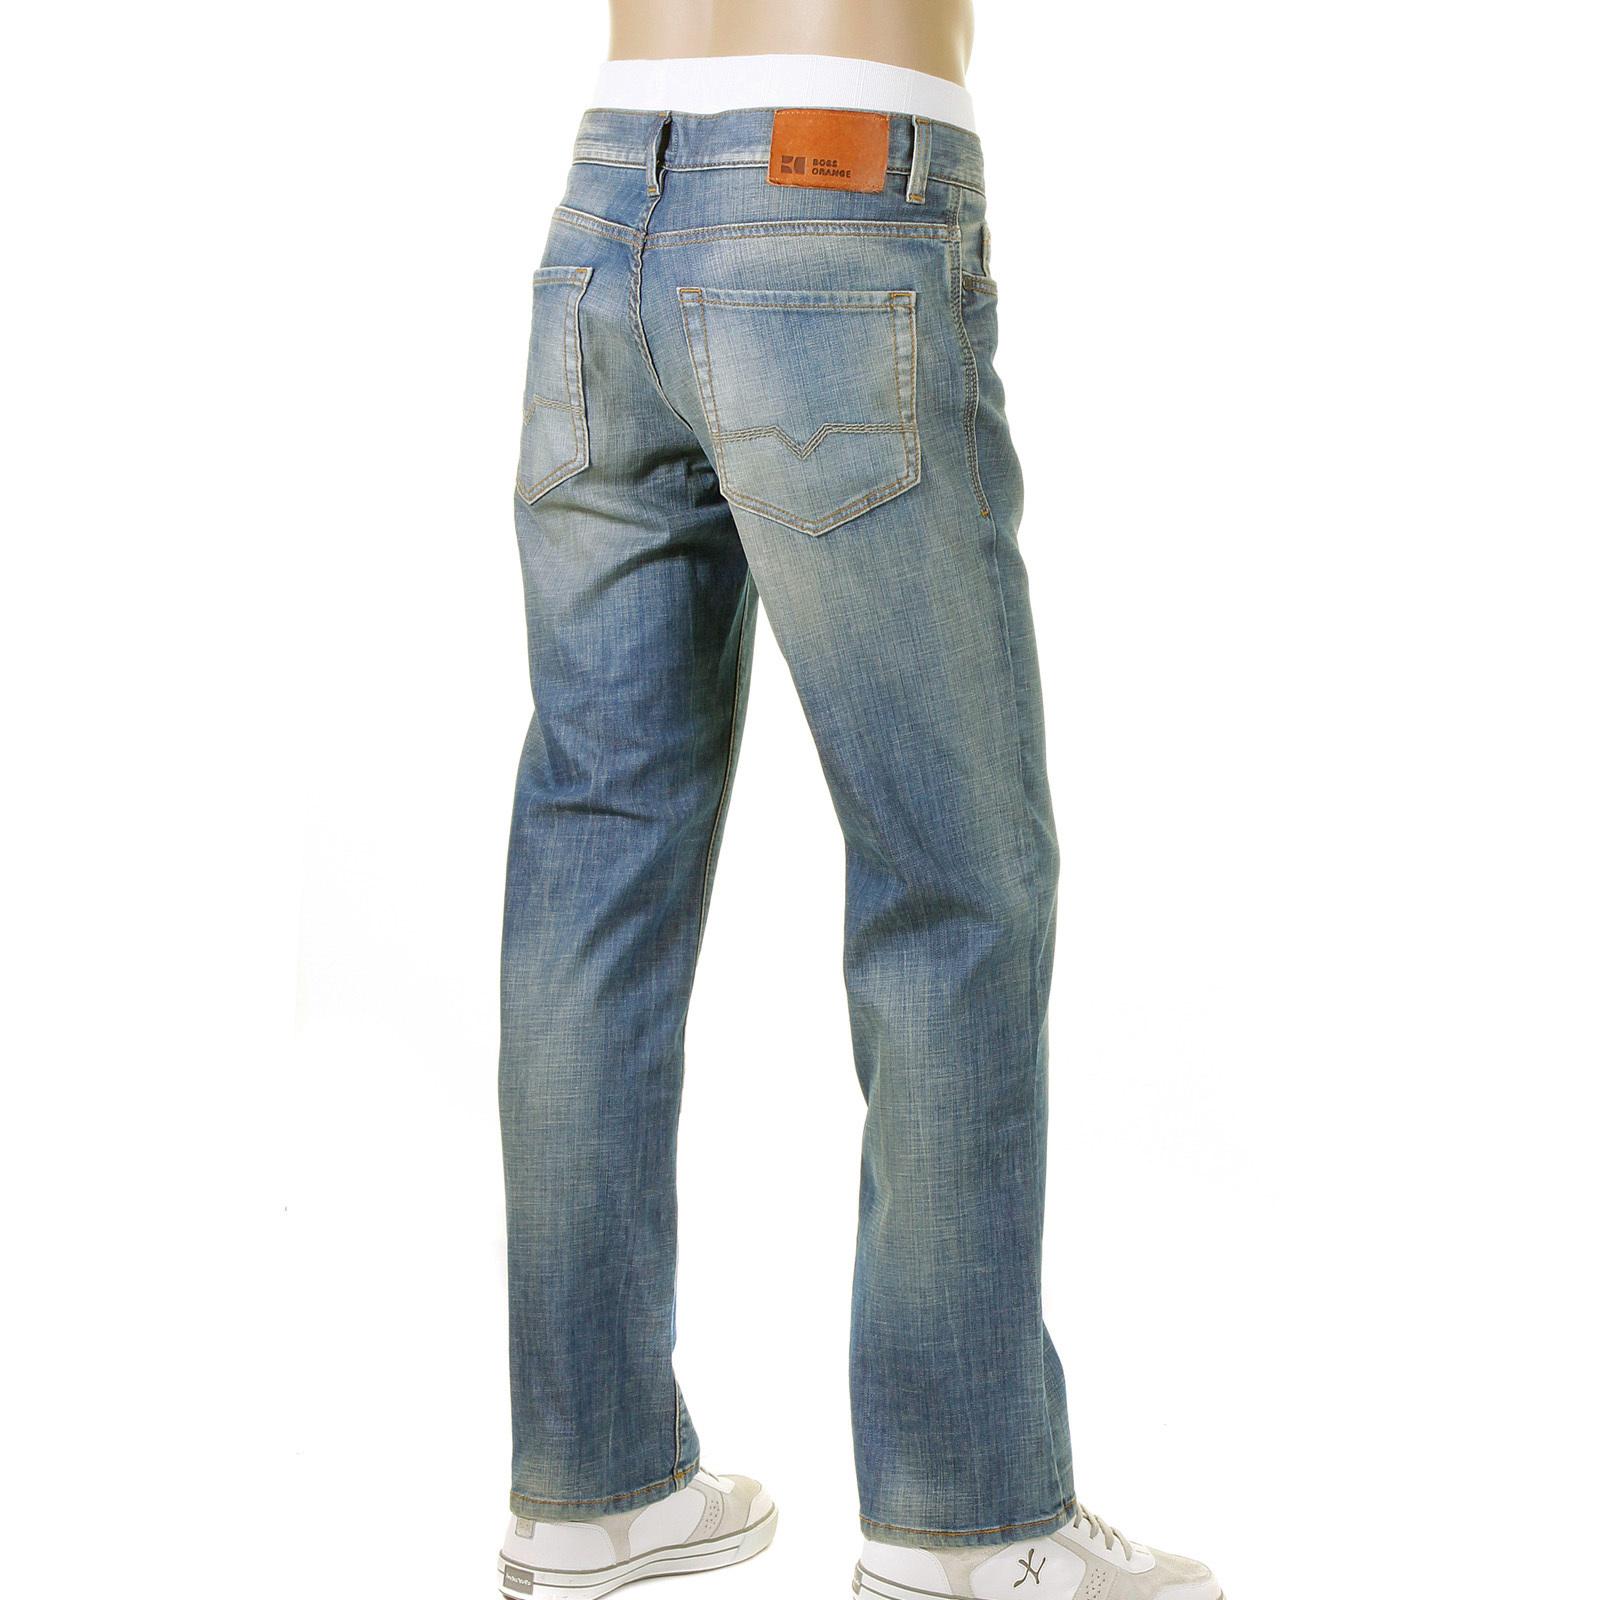 boss orange jeans hb31 450 scraped blue hugo boss denim jean boss4899. Black Bedroom Furniture Sets. Home Design Ideas